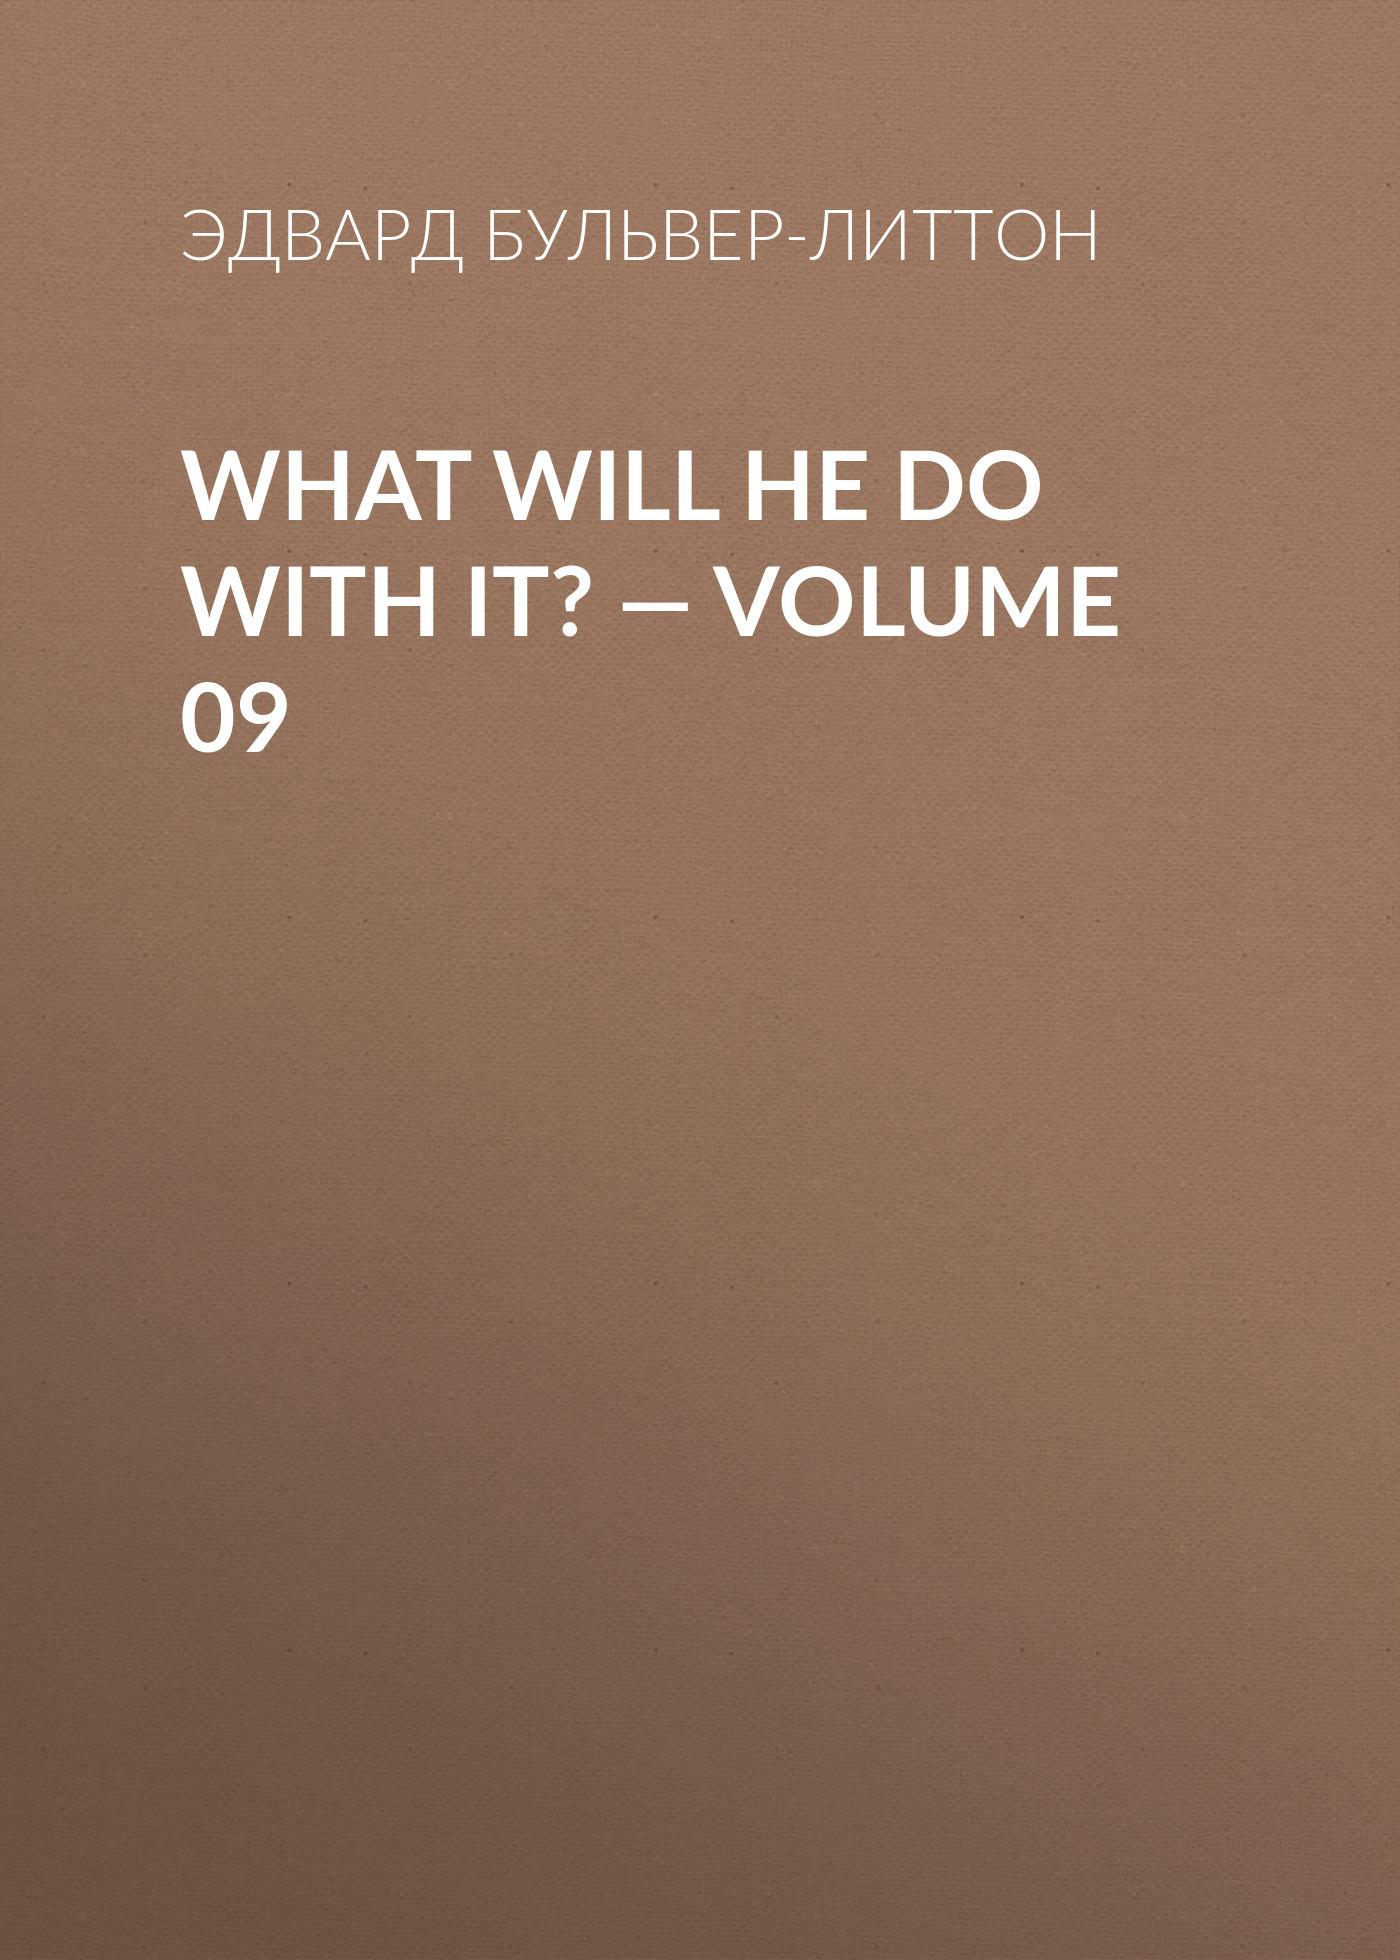 Эдвард Бульвер-Литтон What Will He Do with It? — Volume 09 mk8 aluminum extruder kit with nema 17 stepper motor 1 75mm for 3d printer reprap prusa i3